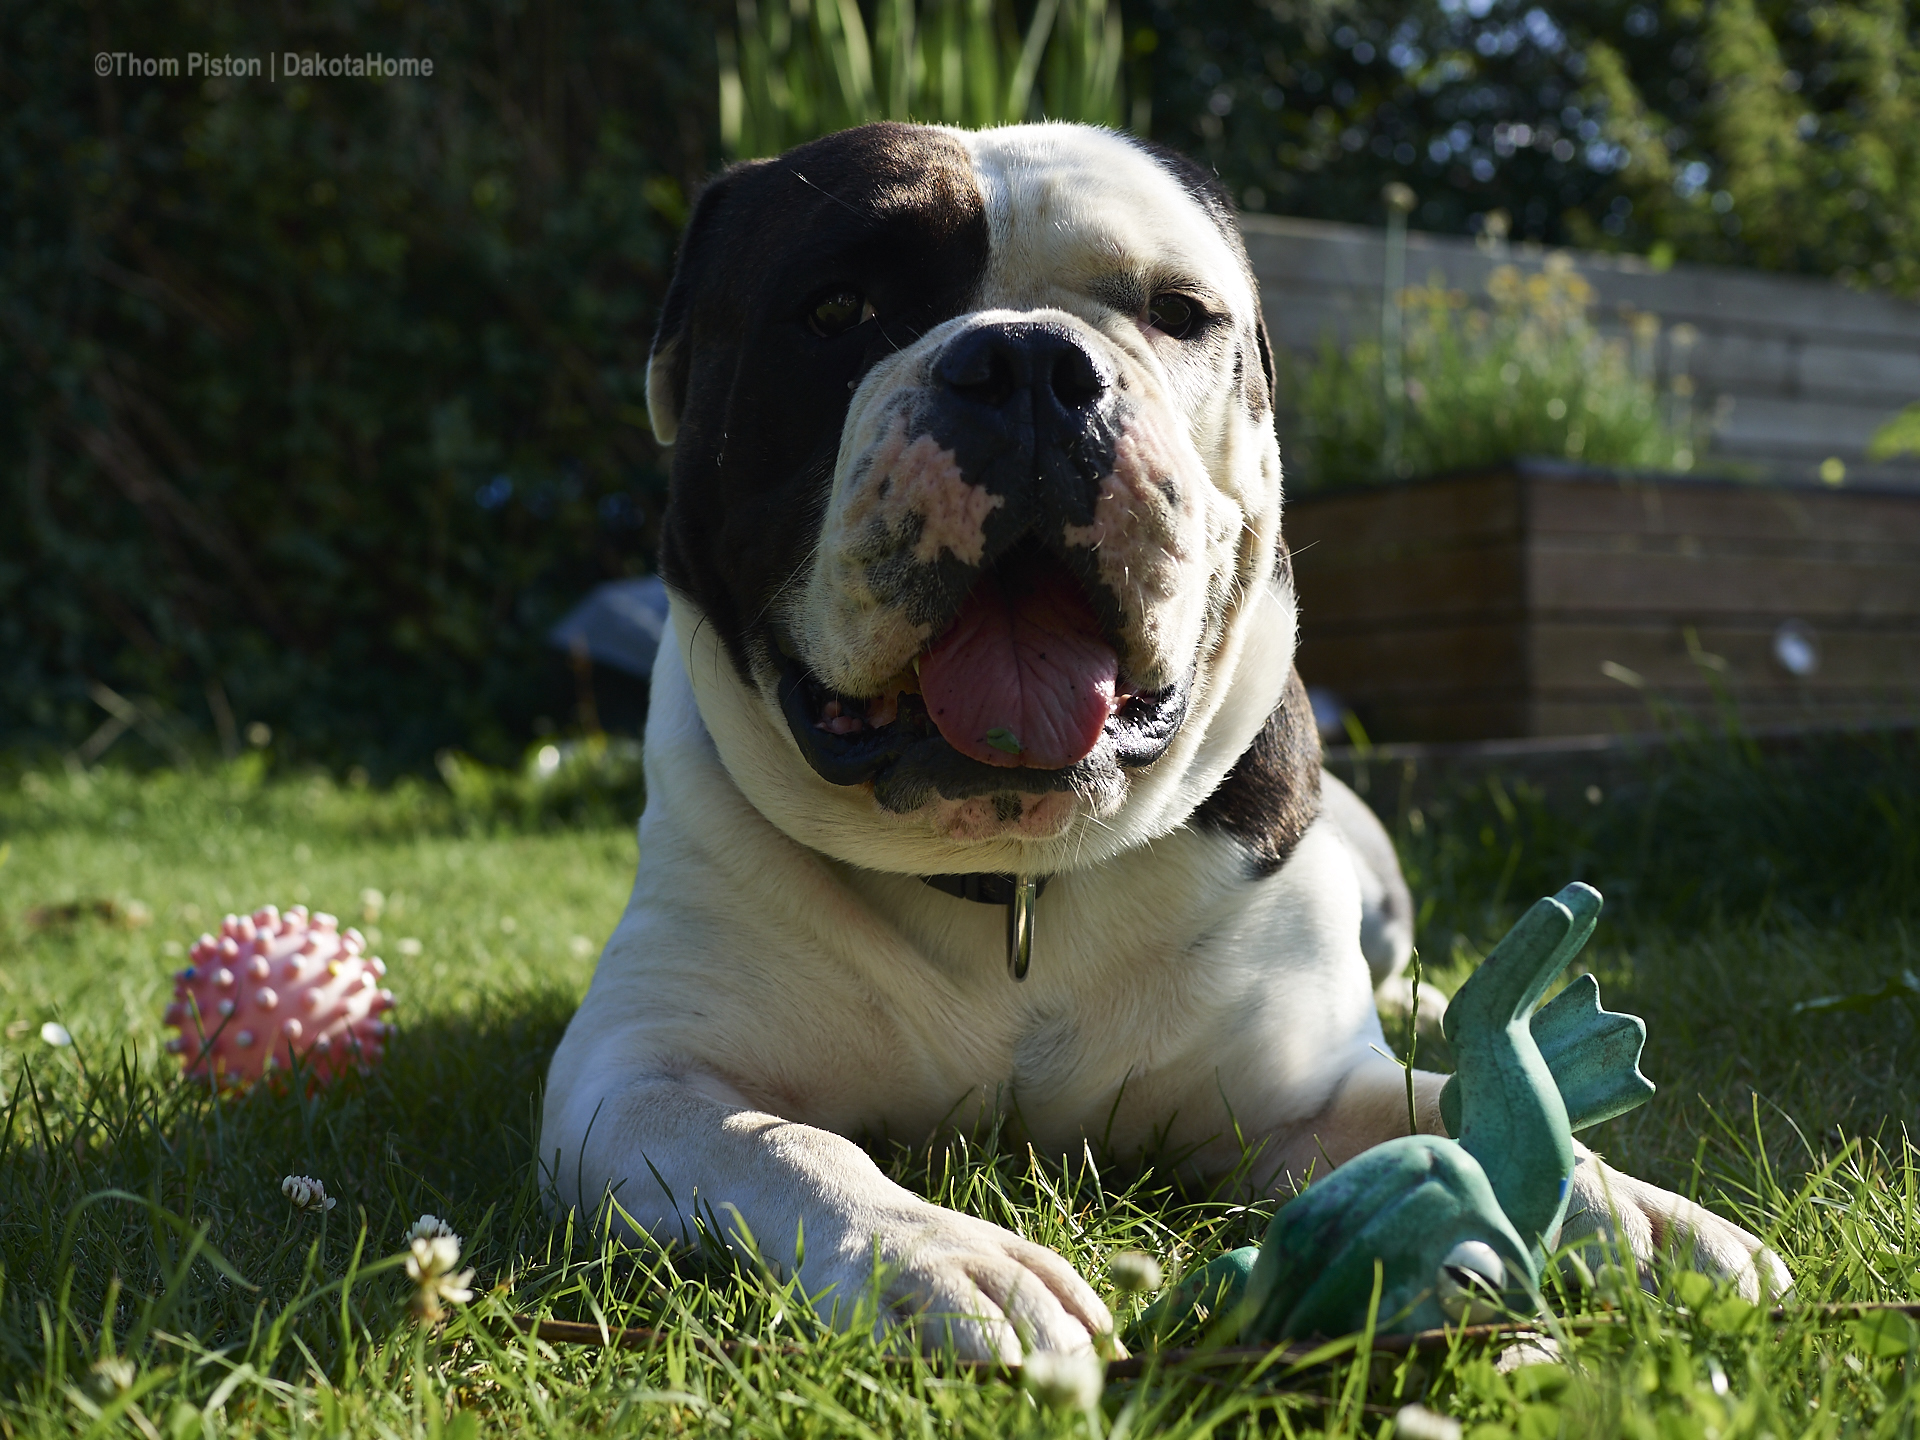 alwin the oldebritish bulldog